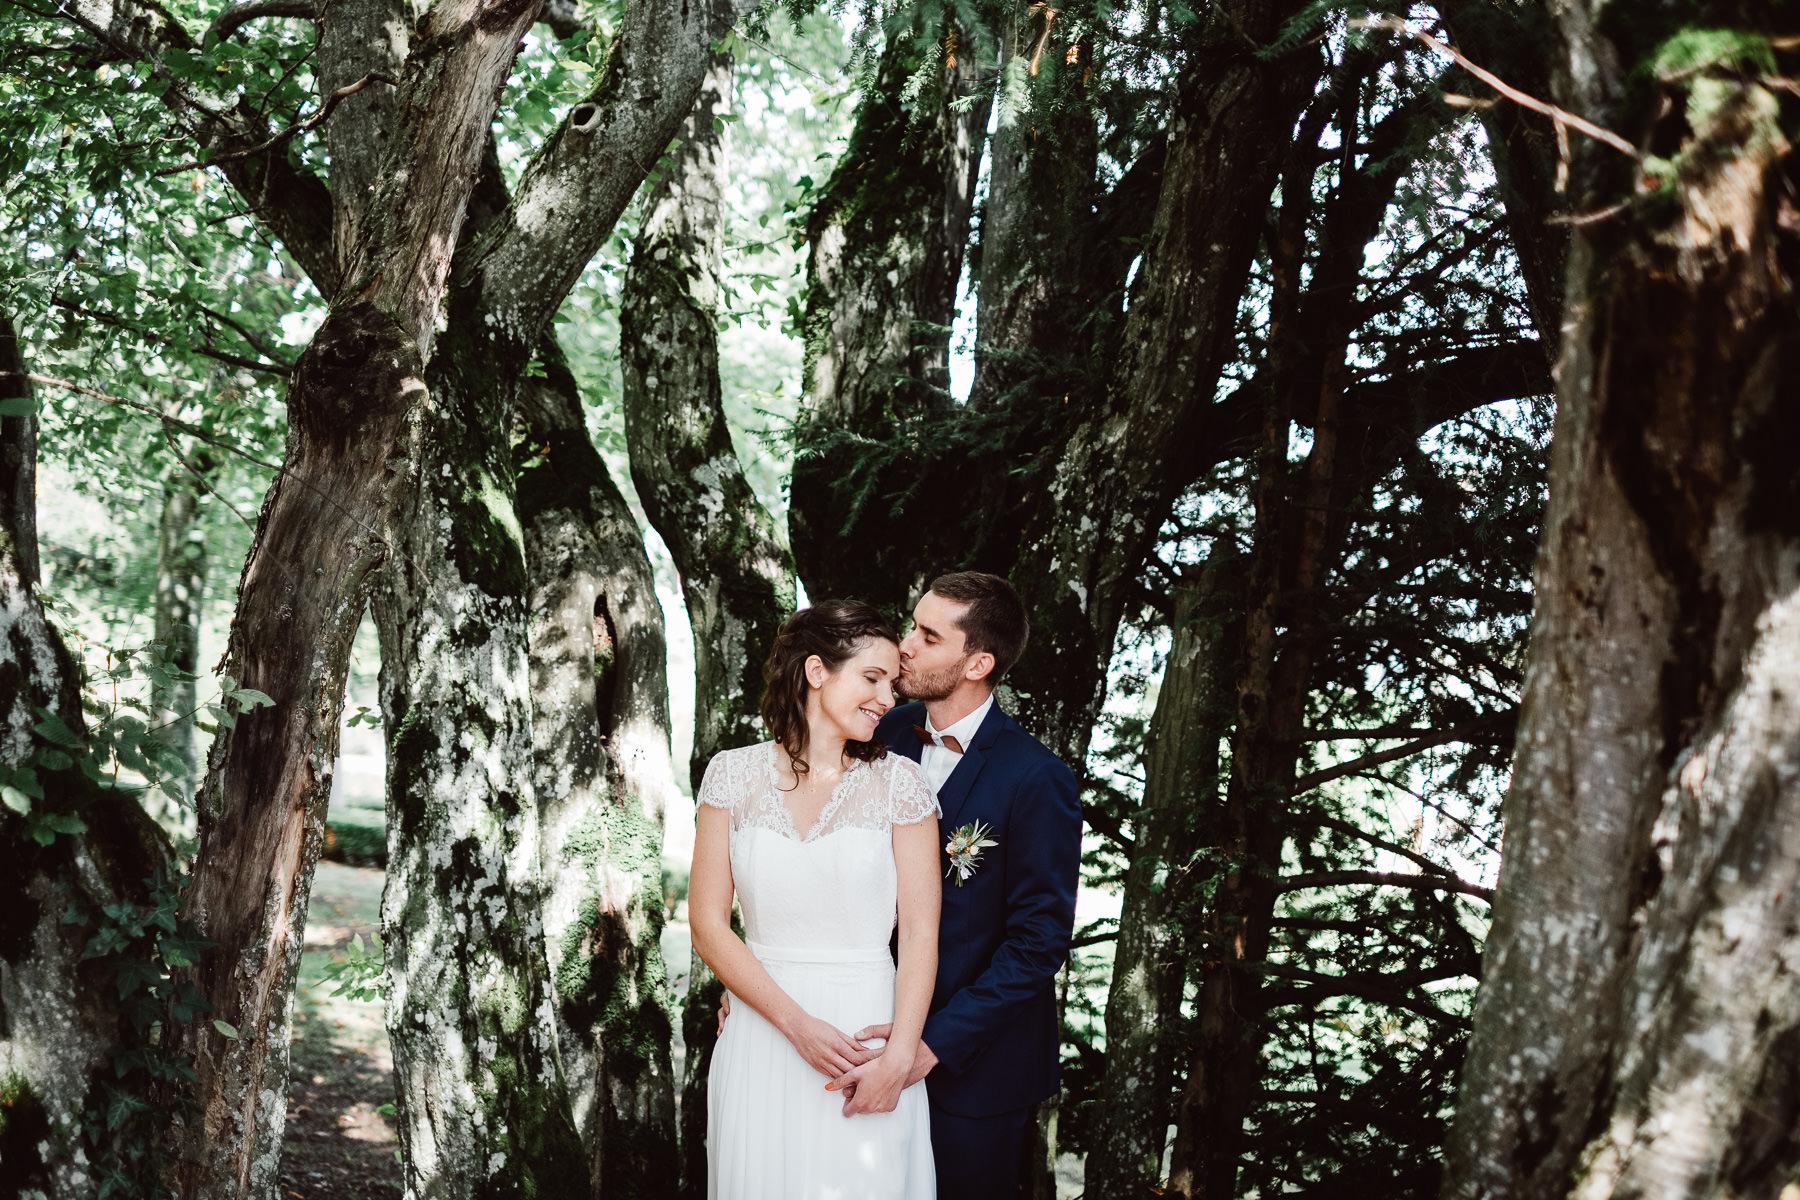 Photographe mariage domaine des Saints Peres Chambery Pastel Boheme Chic